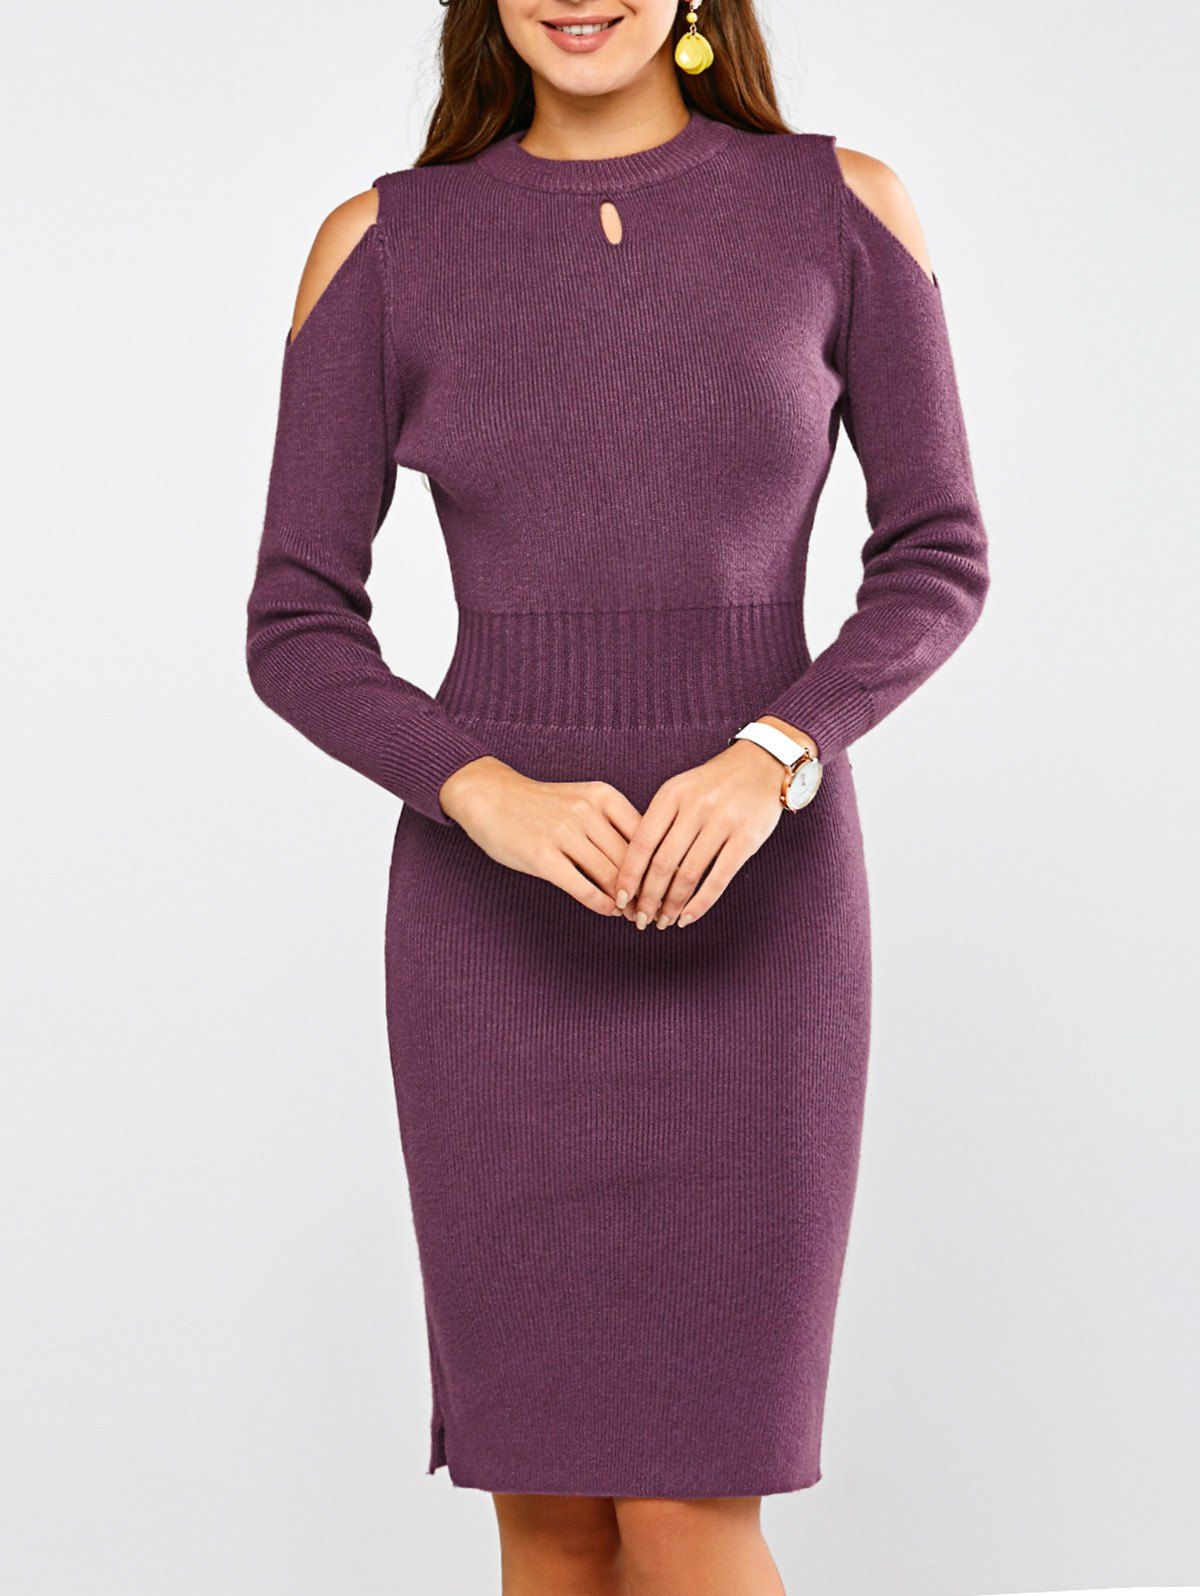 Long Sleeve Cold Shoulder Sweater Dress In Purple Sammydress